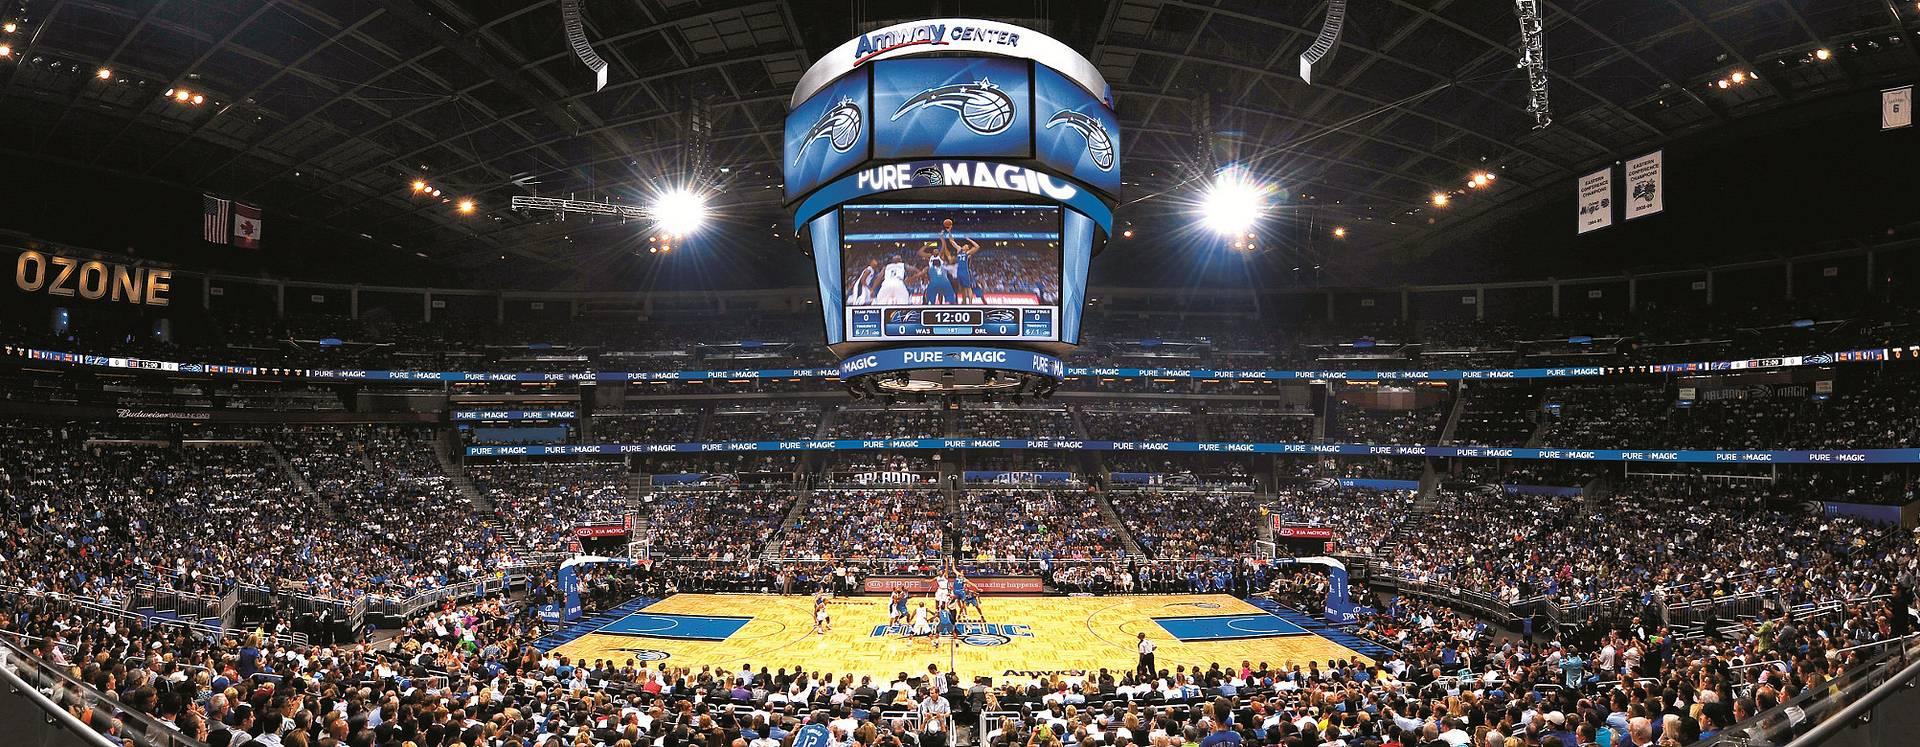 Orlando Magic, o time de basquete de Orlando, jogando no Amway Center